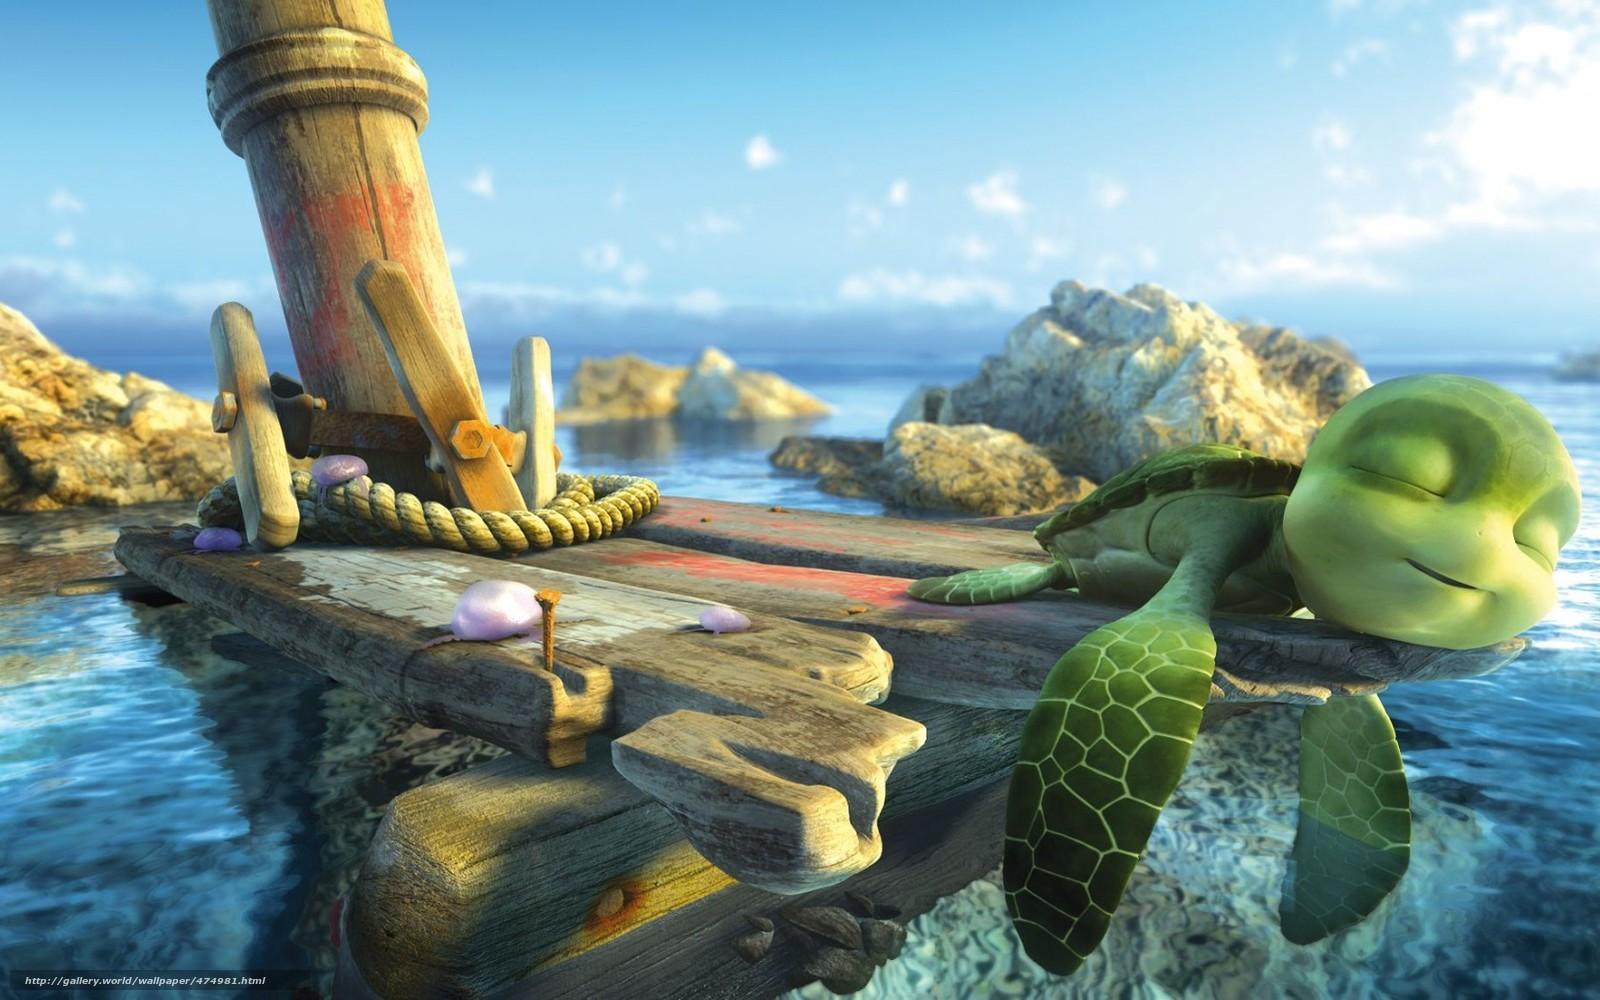 Scaricare gli sfondi tartaruga cartone animato sammy